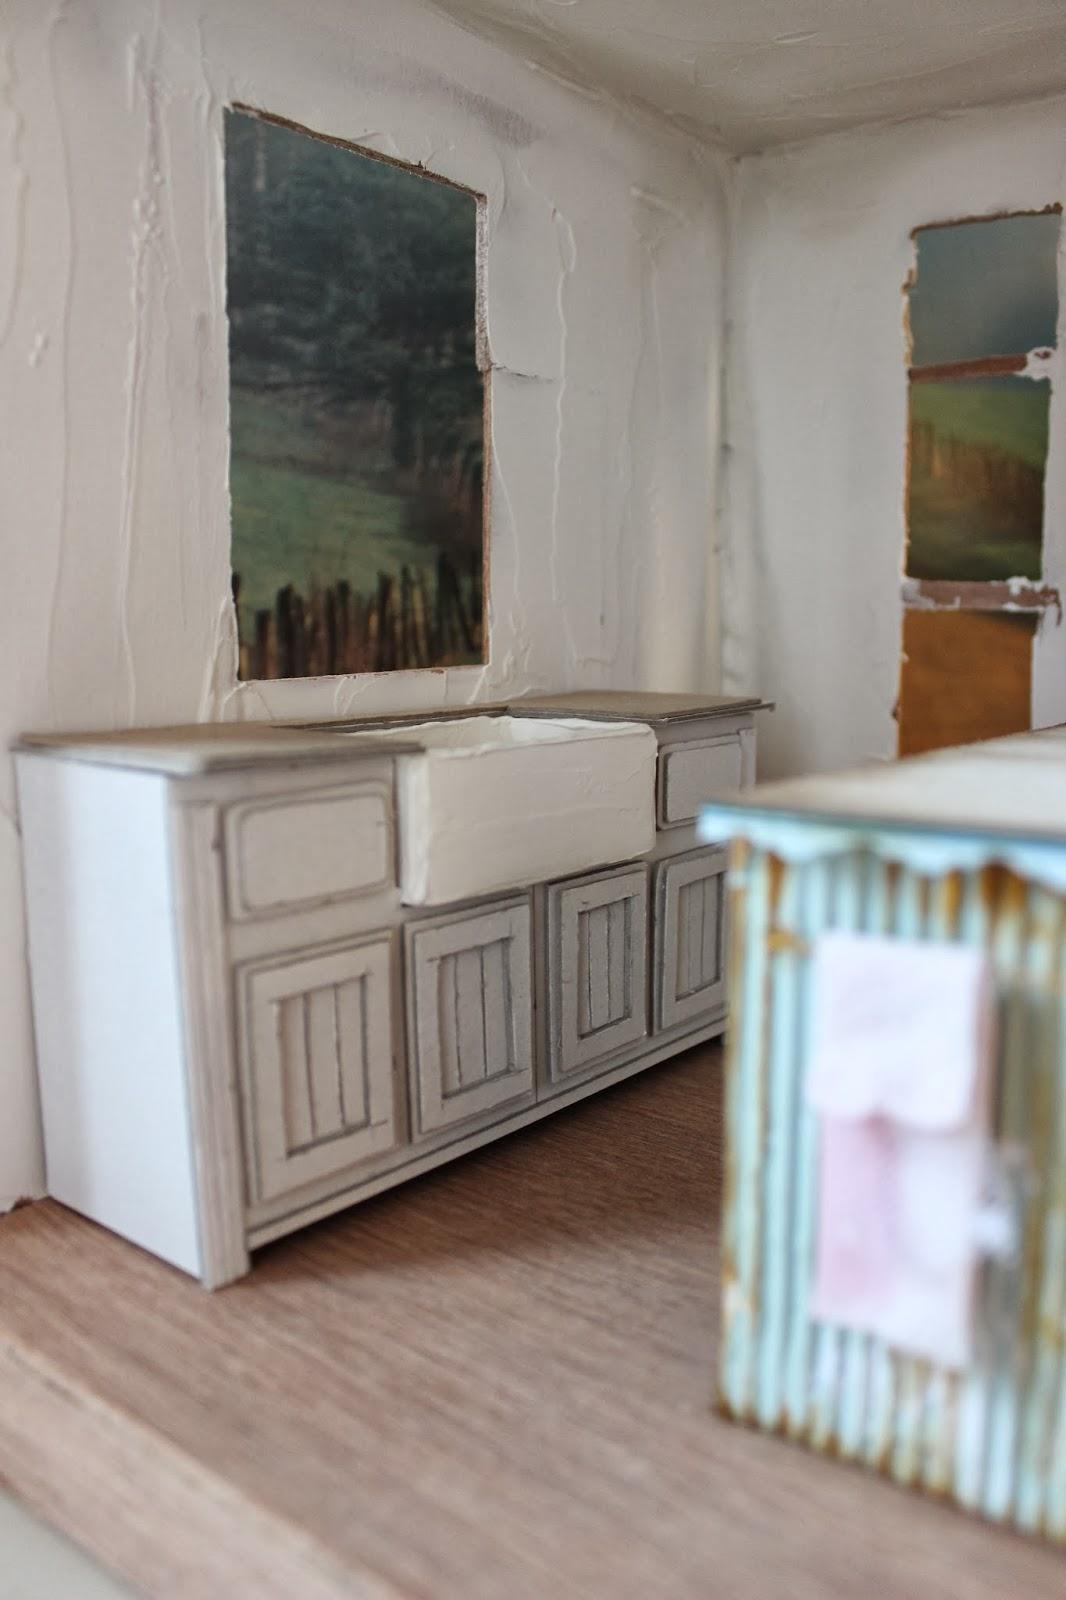 Cinderella Moments: Lulu's Maison on frank sinatra home, dionne warwick home, barry white home, van morrison home, john lennon home, meghan trainor home,